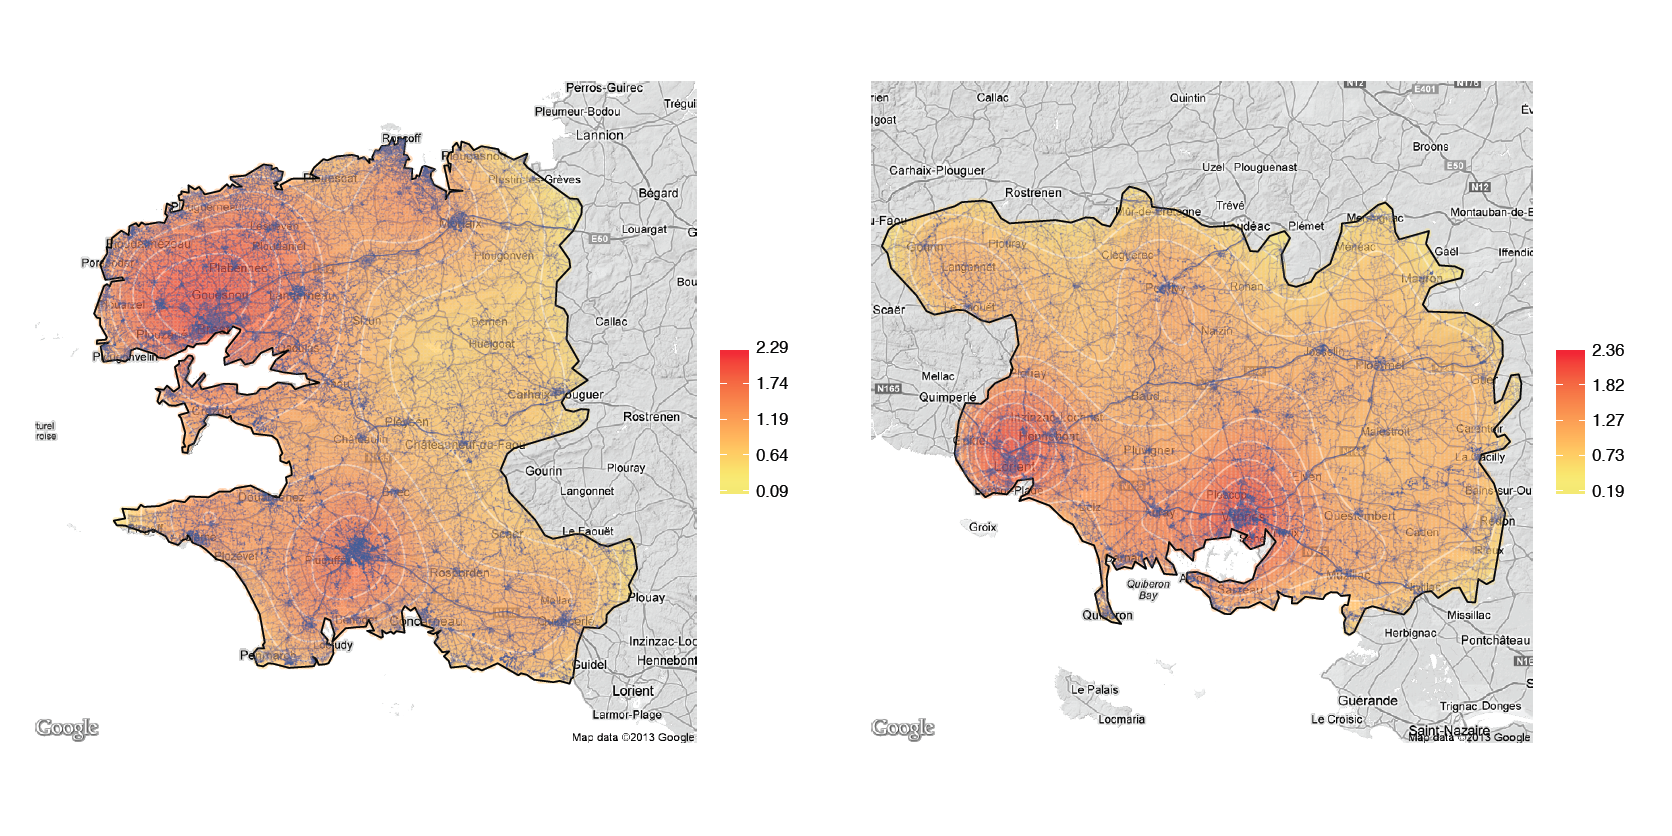 Visualizing densities of spatial processes – Ewen Gallic